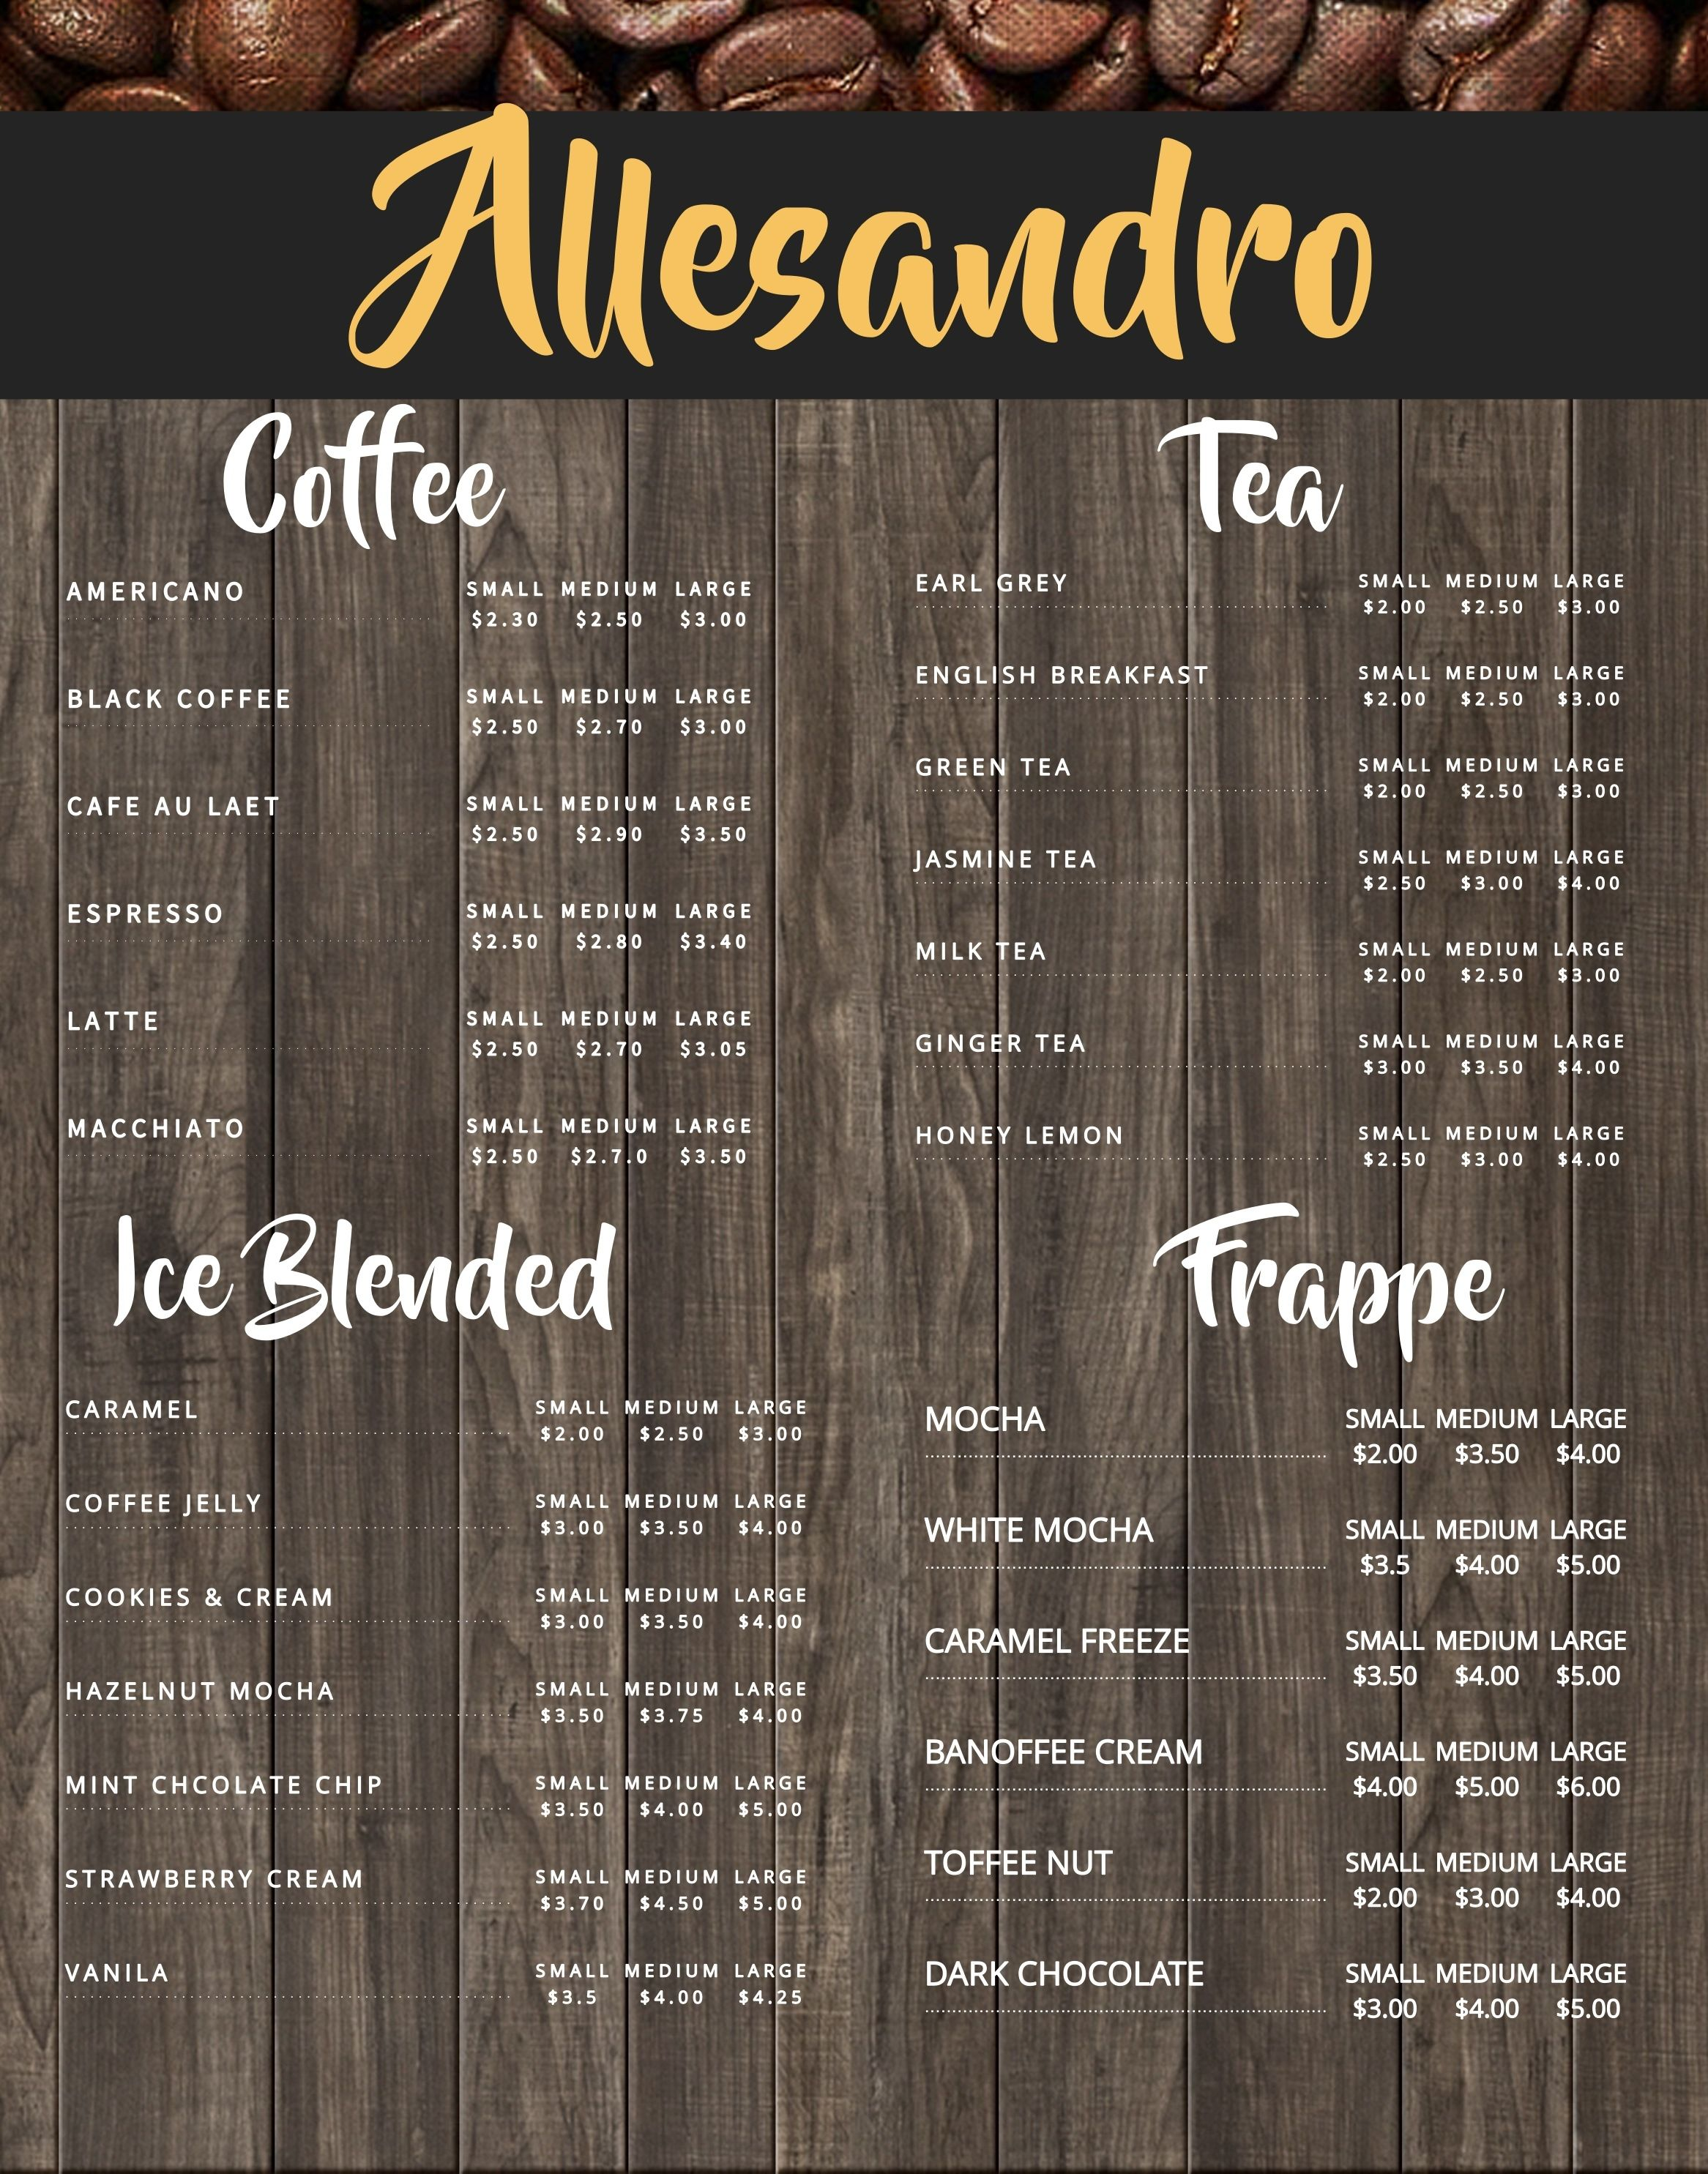 Coffee shop menu board design template. Click to customize ...